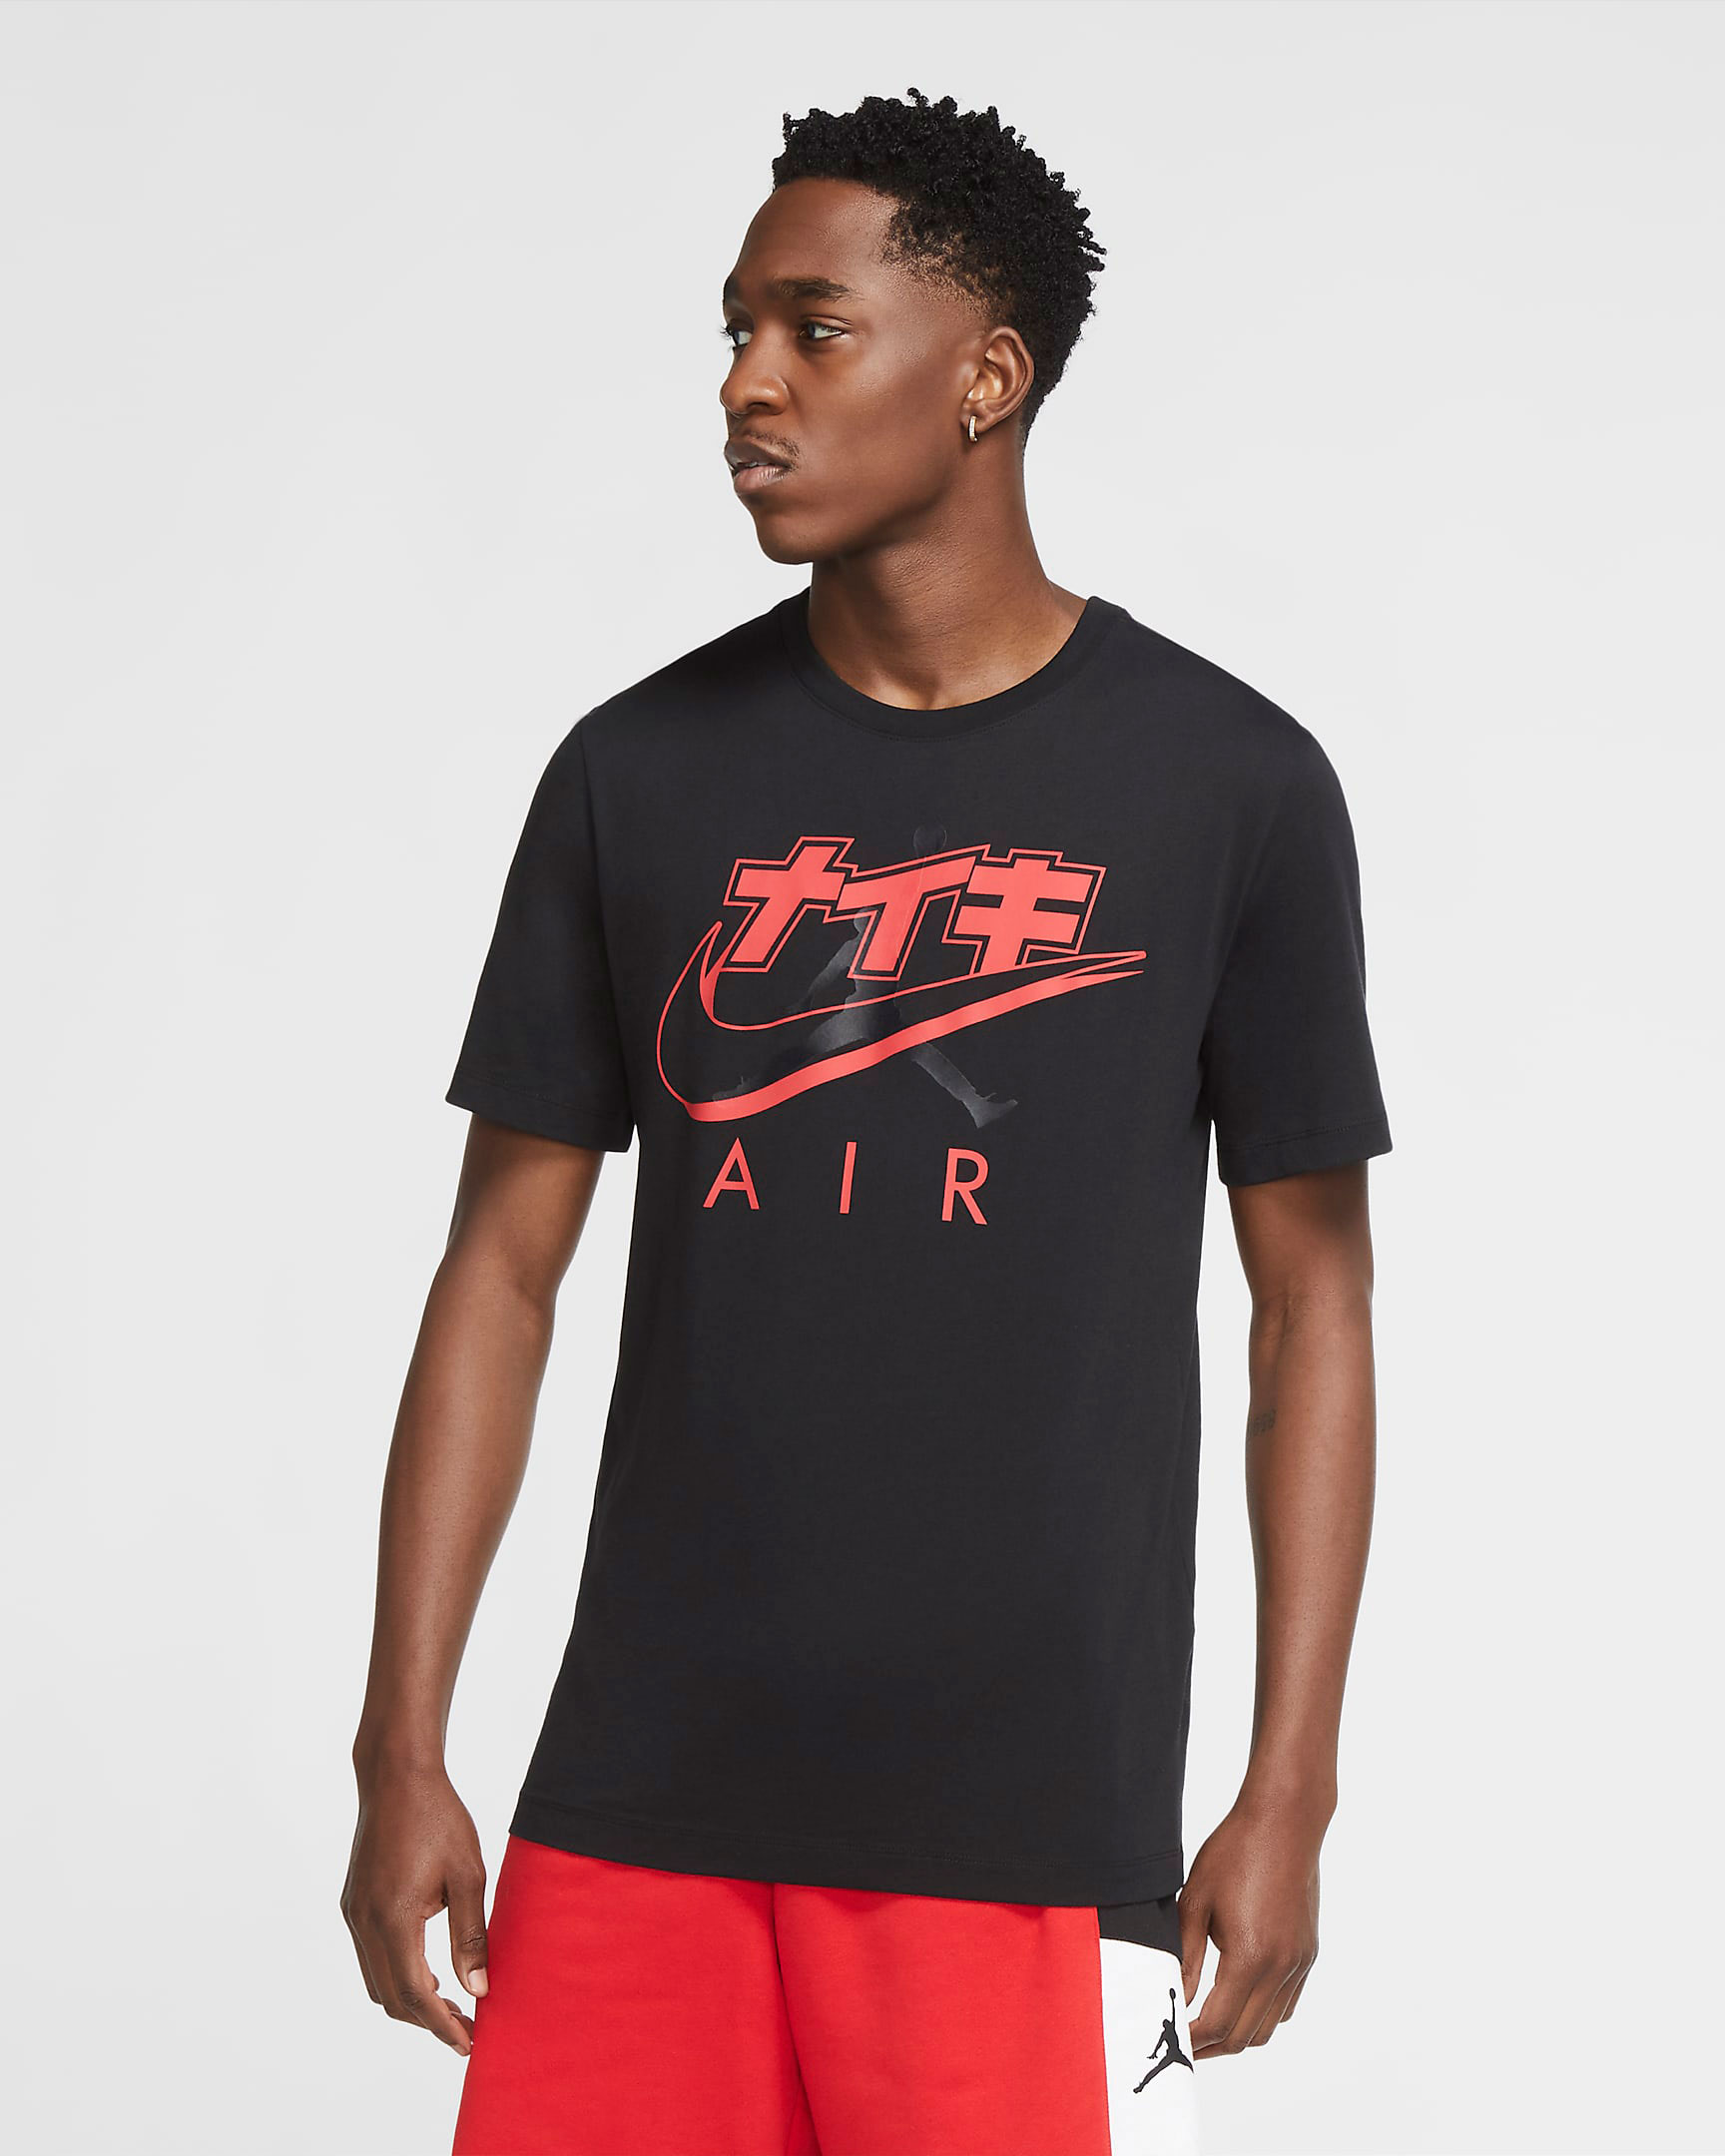 air-jordan-3-denim-fire-red-japan-shirt-black-1